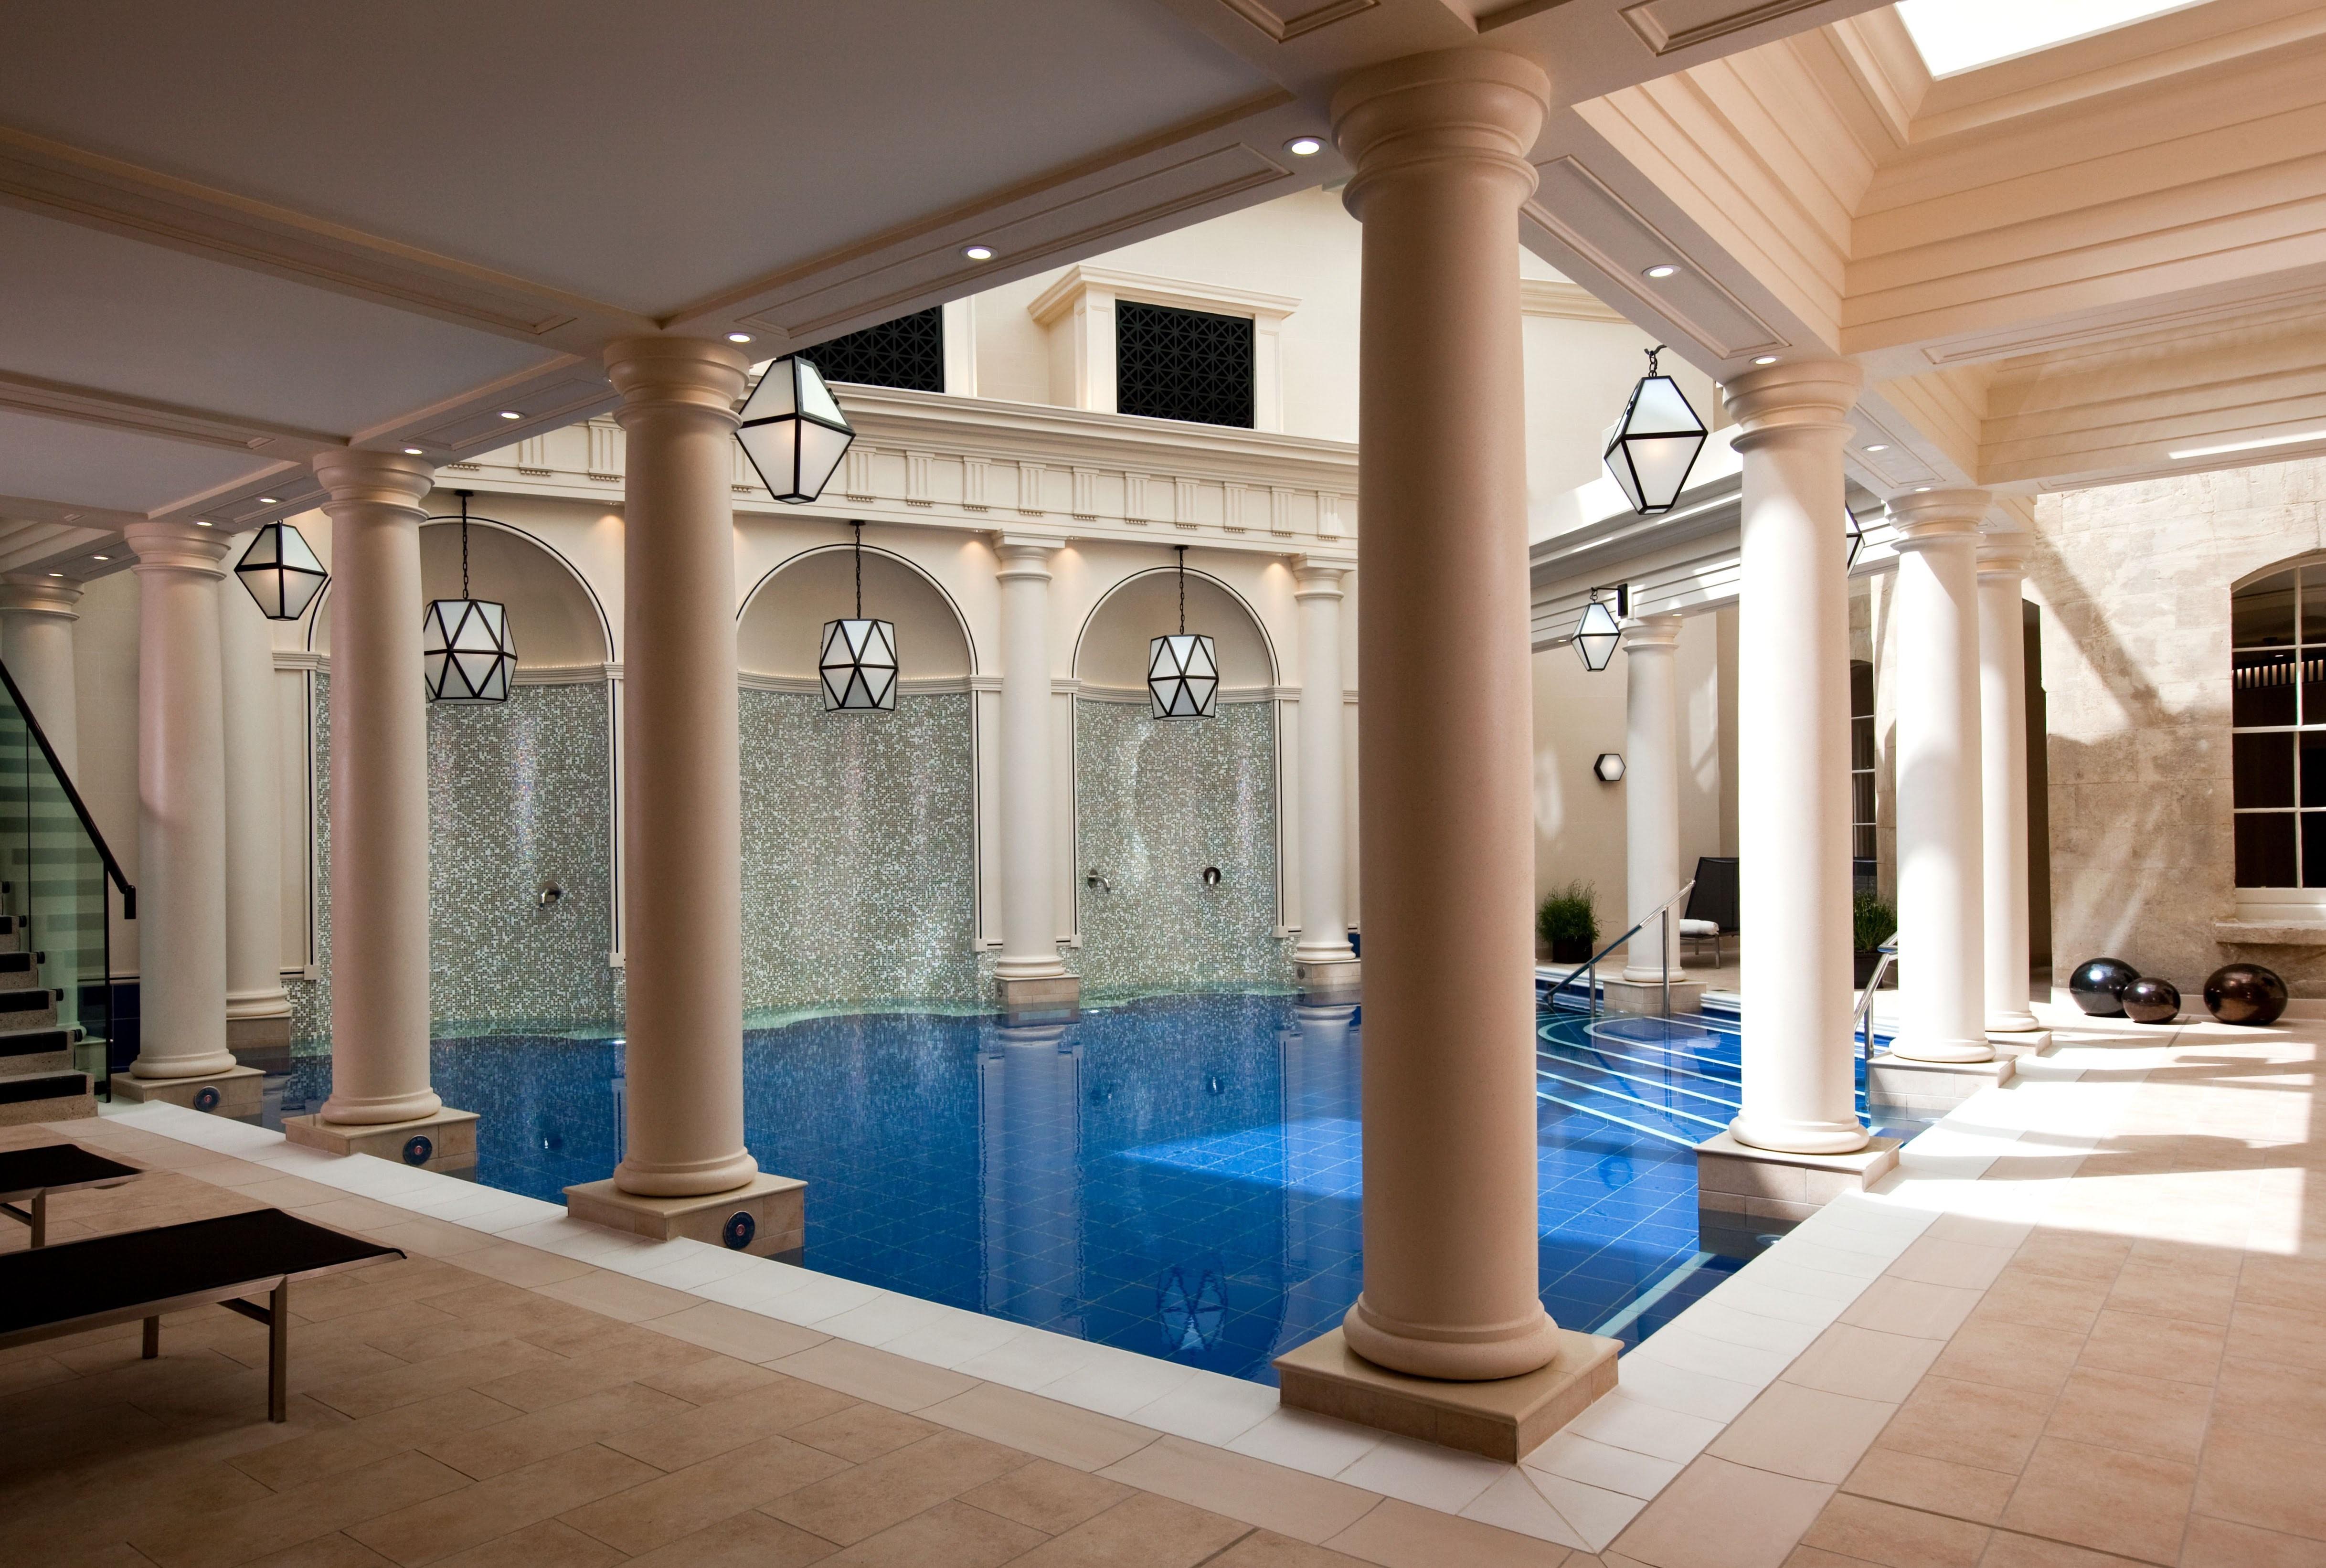 Courtesy of The Gainsborough Bath Spa / Expedia